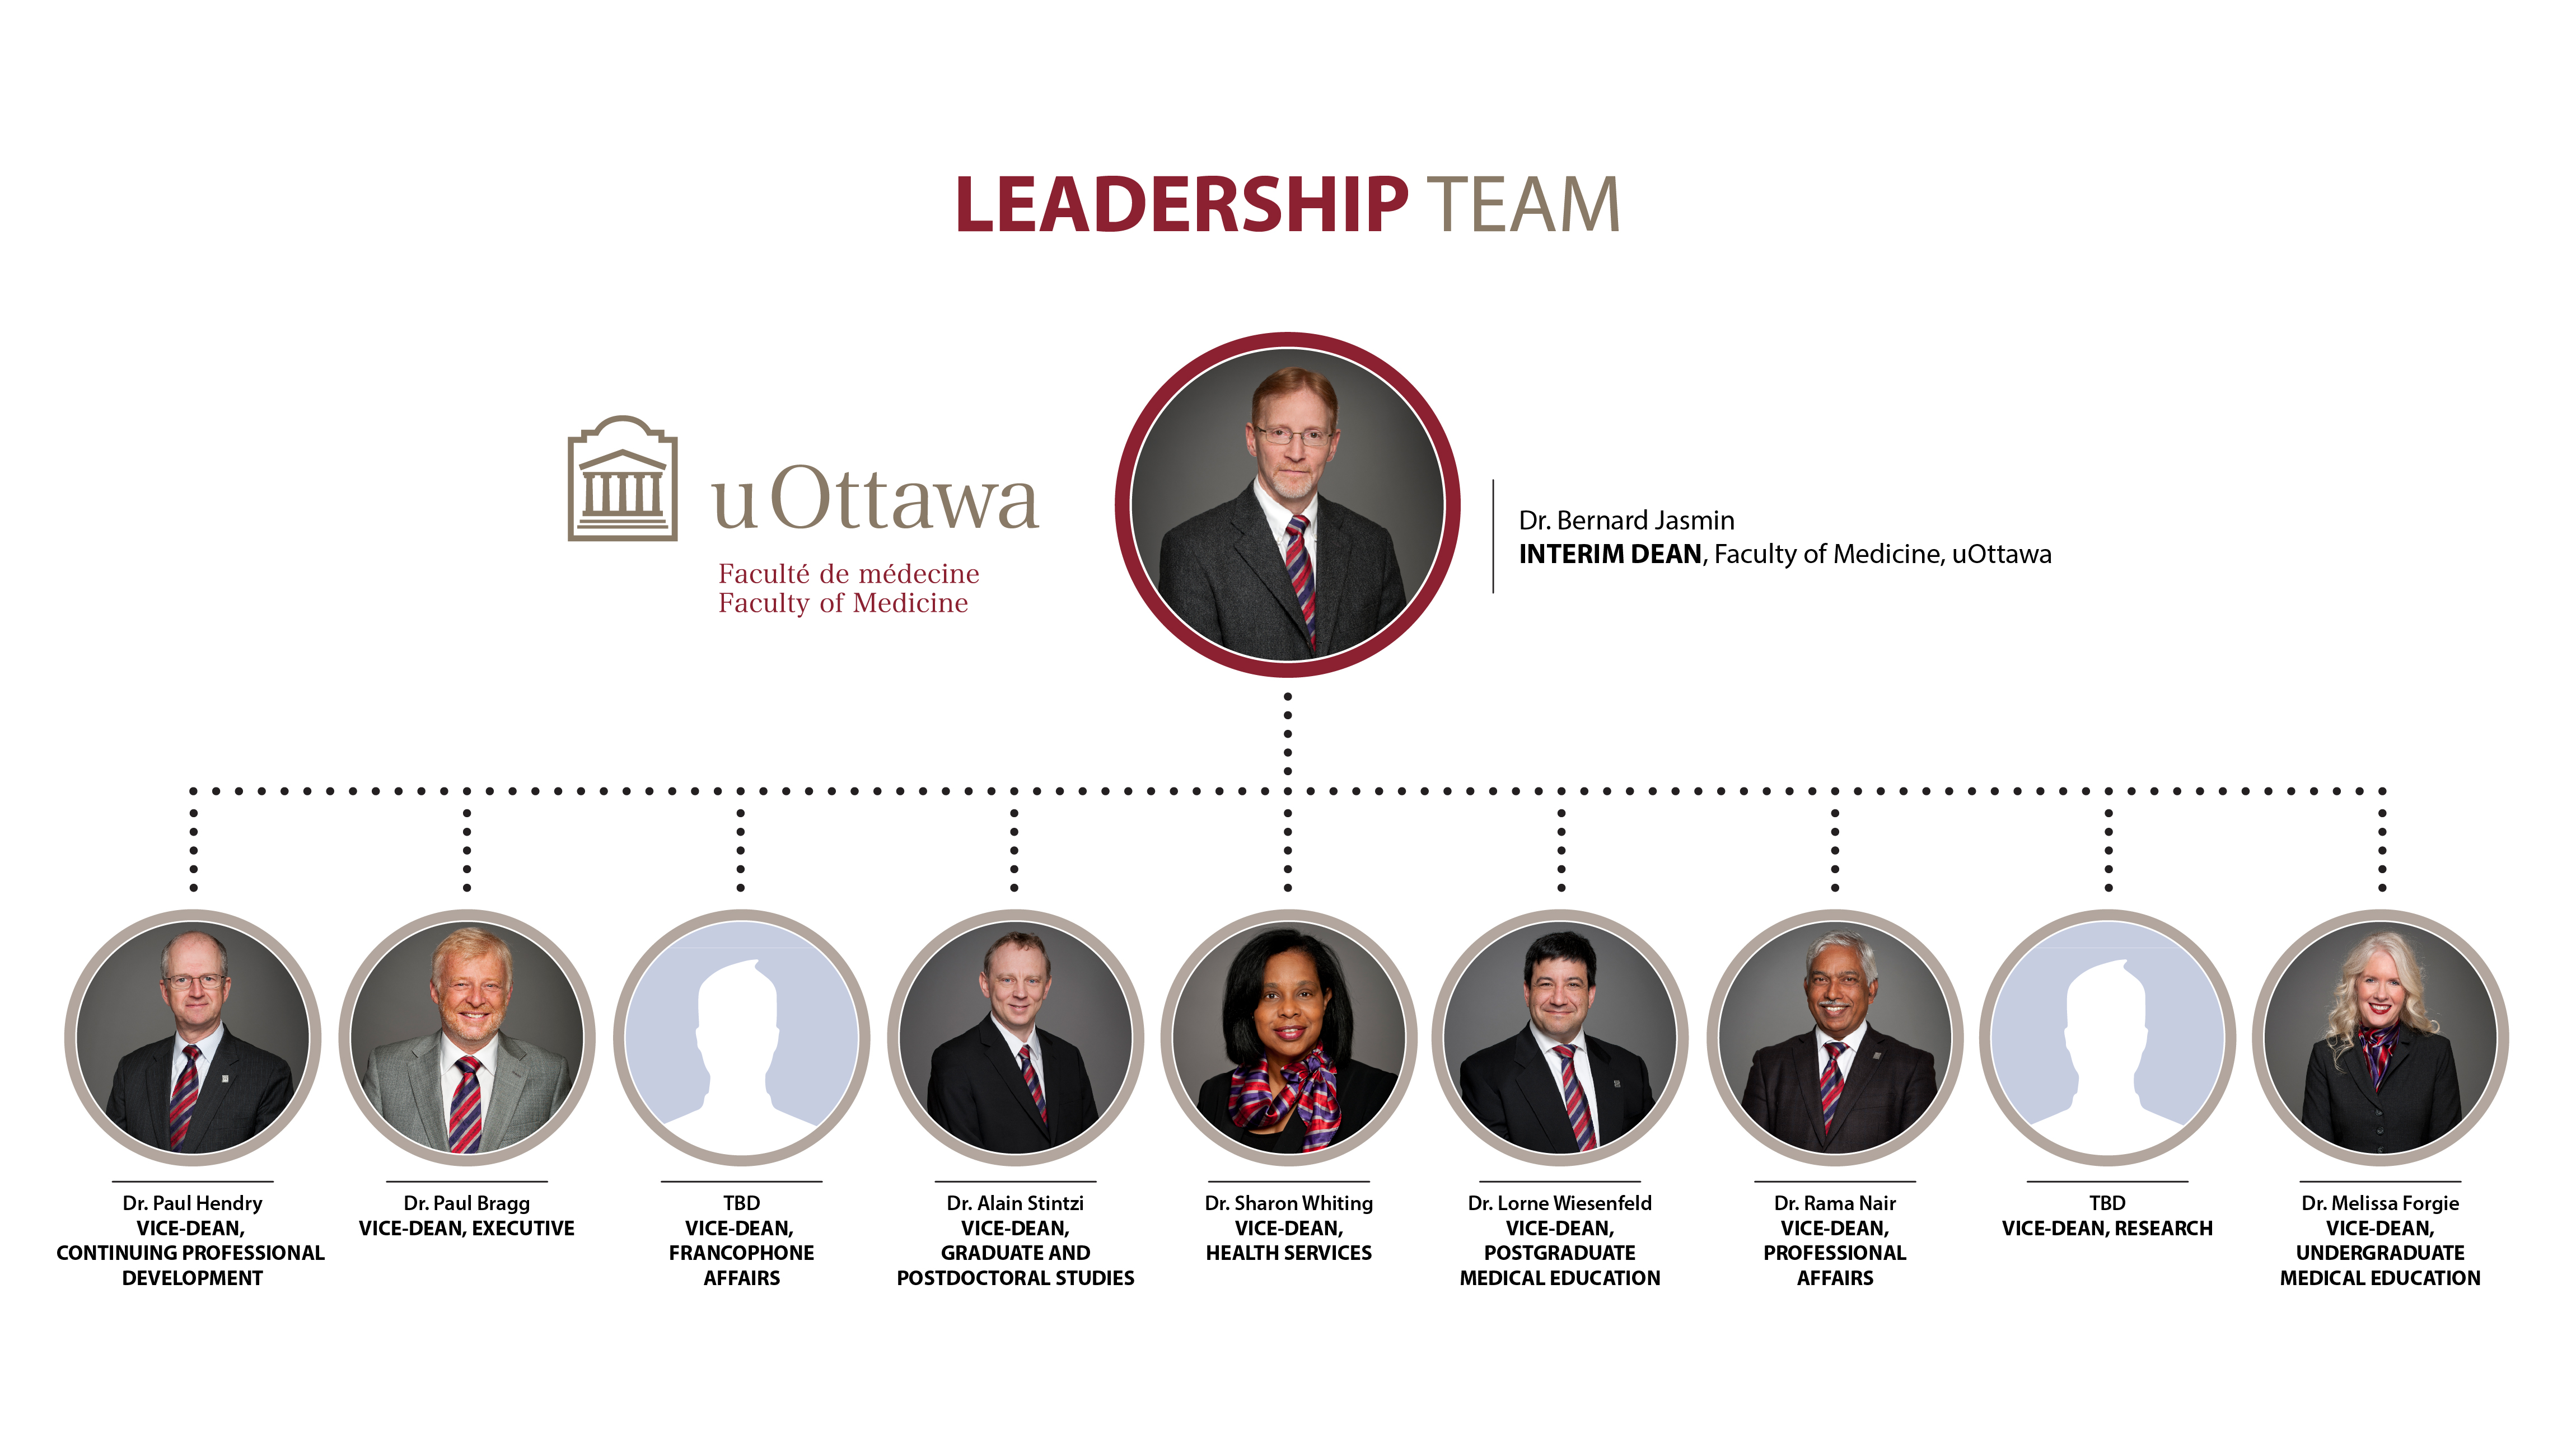 Leadership Team Organization Chart for 2017